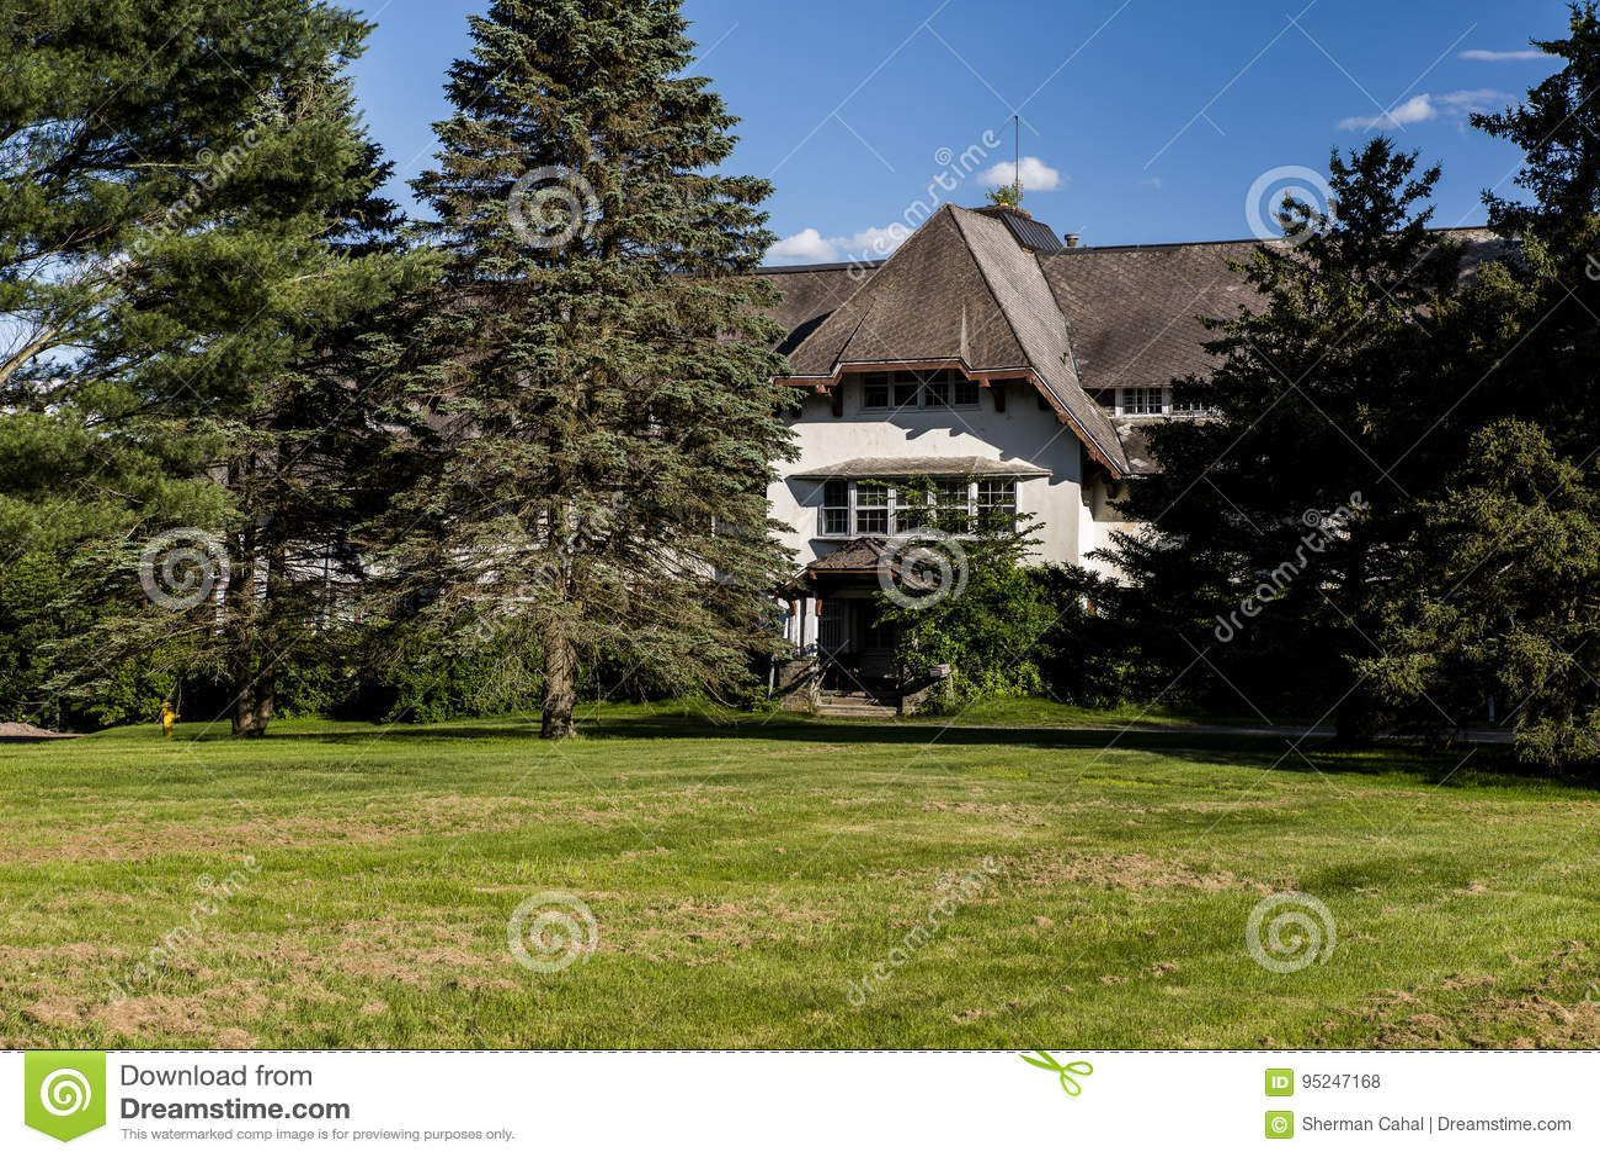 Abandoned Hospital / Sanitarium - Catskill Mountains, New York